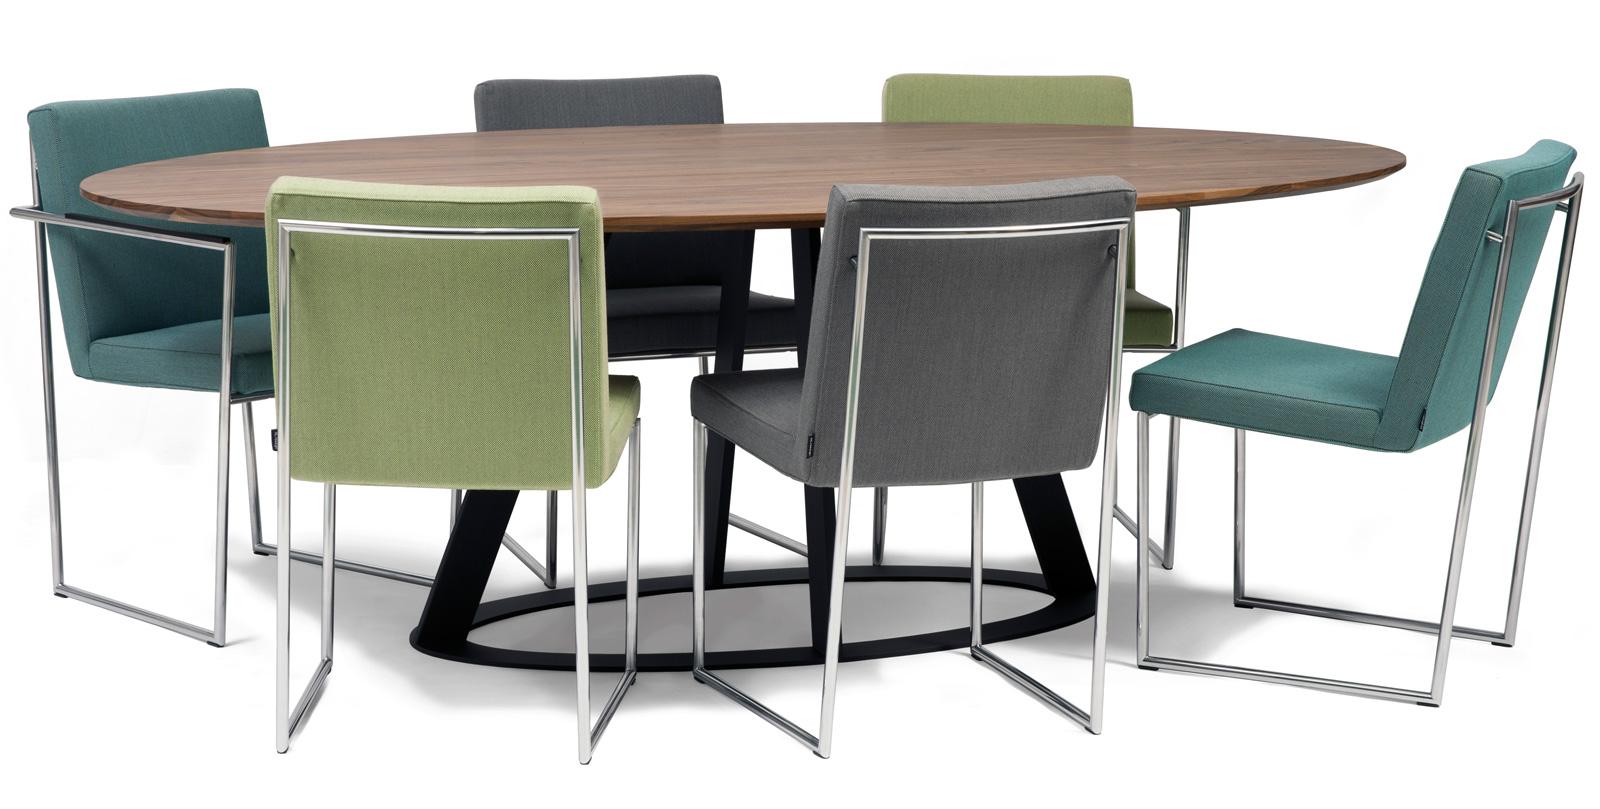 Fier ovale tafel harvink tafels